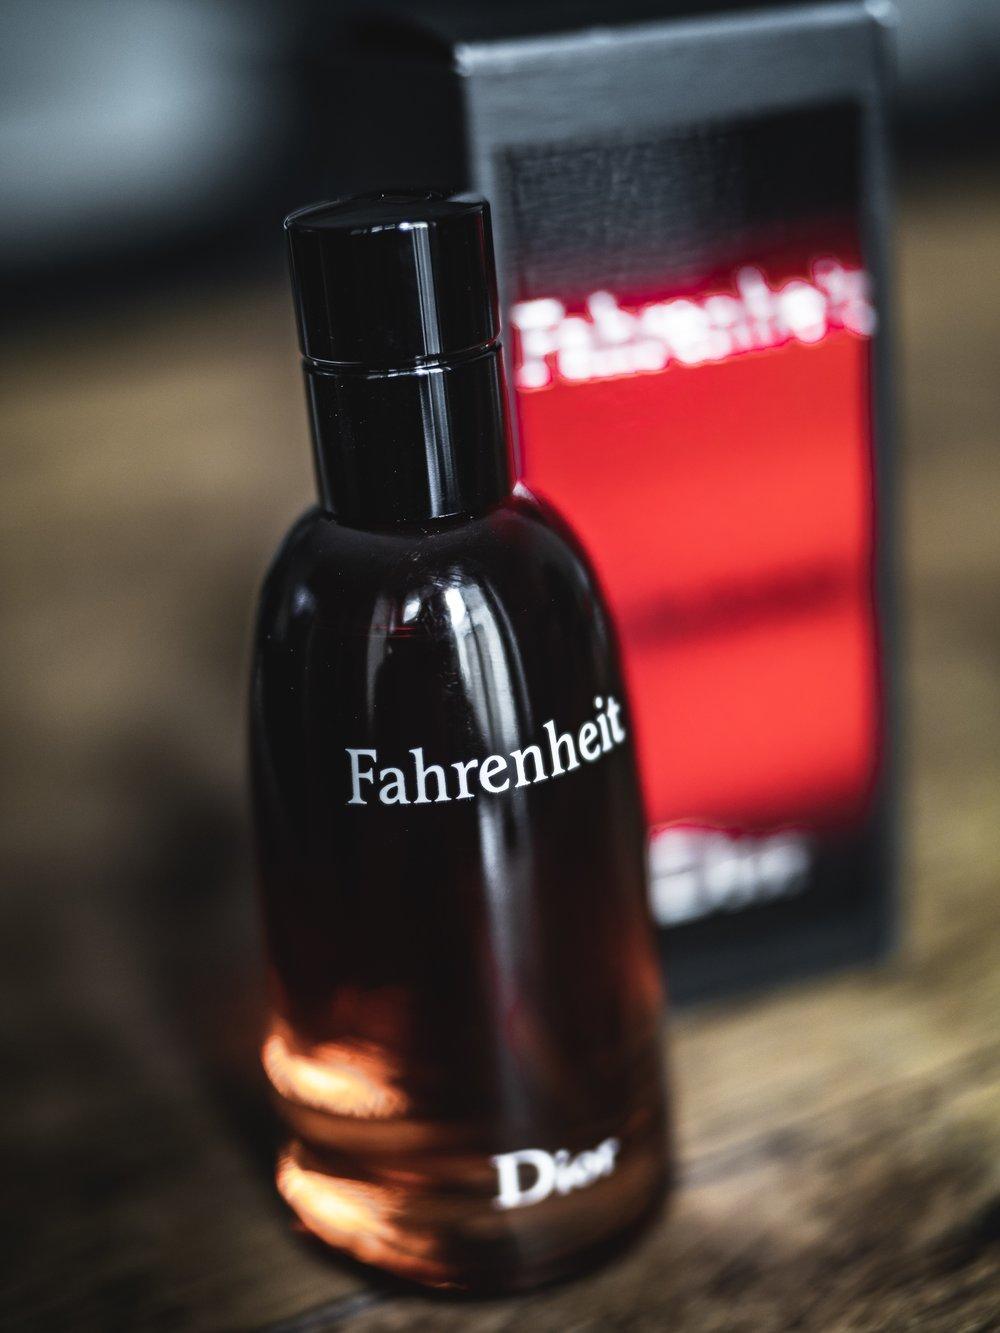 Dior Fahrenheit Fragrance Review